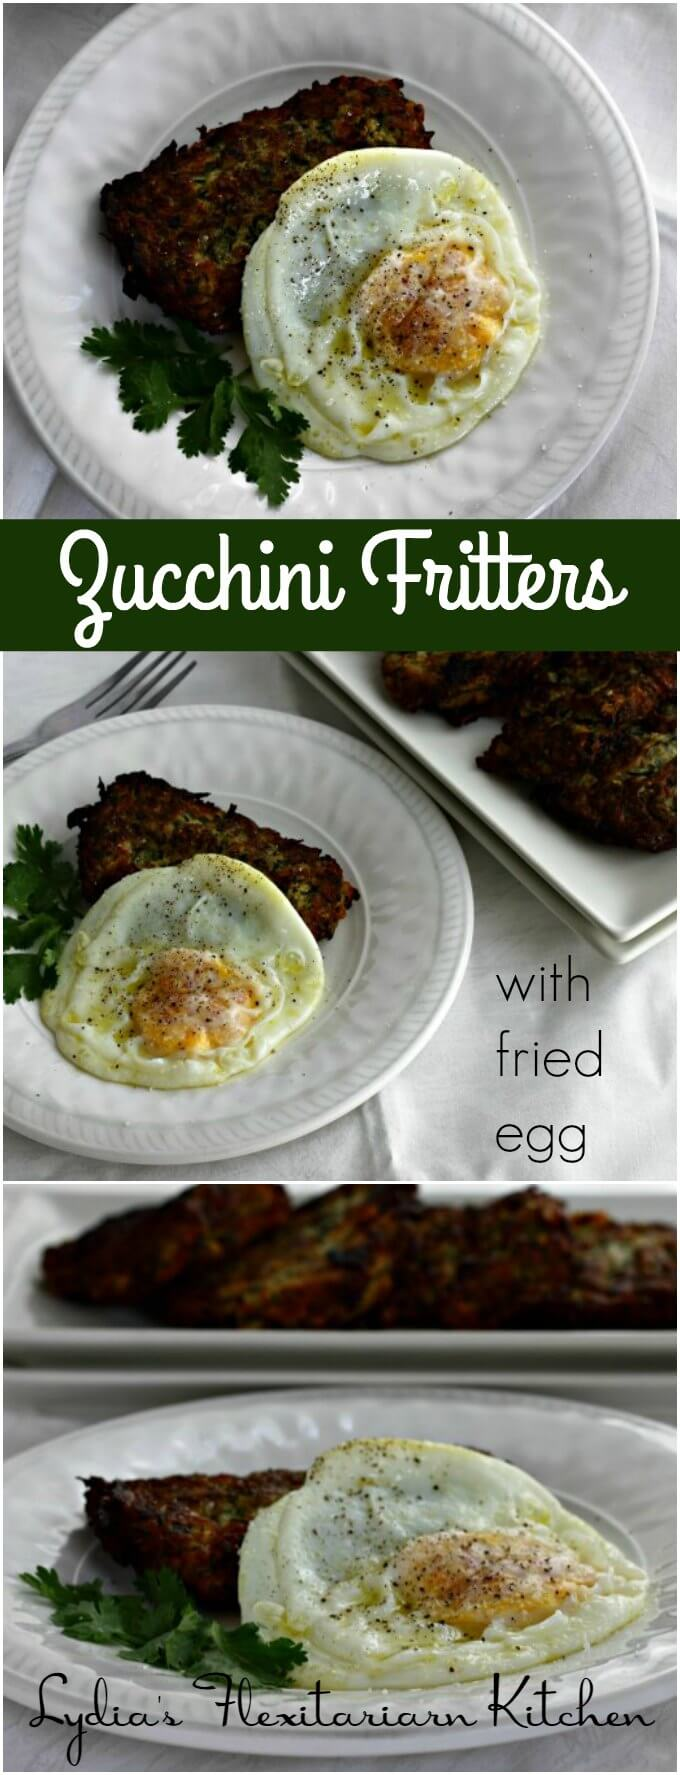 Zarangollo ~ Zucchini Fritters with Fried Egg ~ Lydia's Flexitarian Kitchen